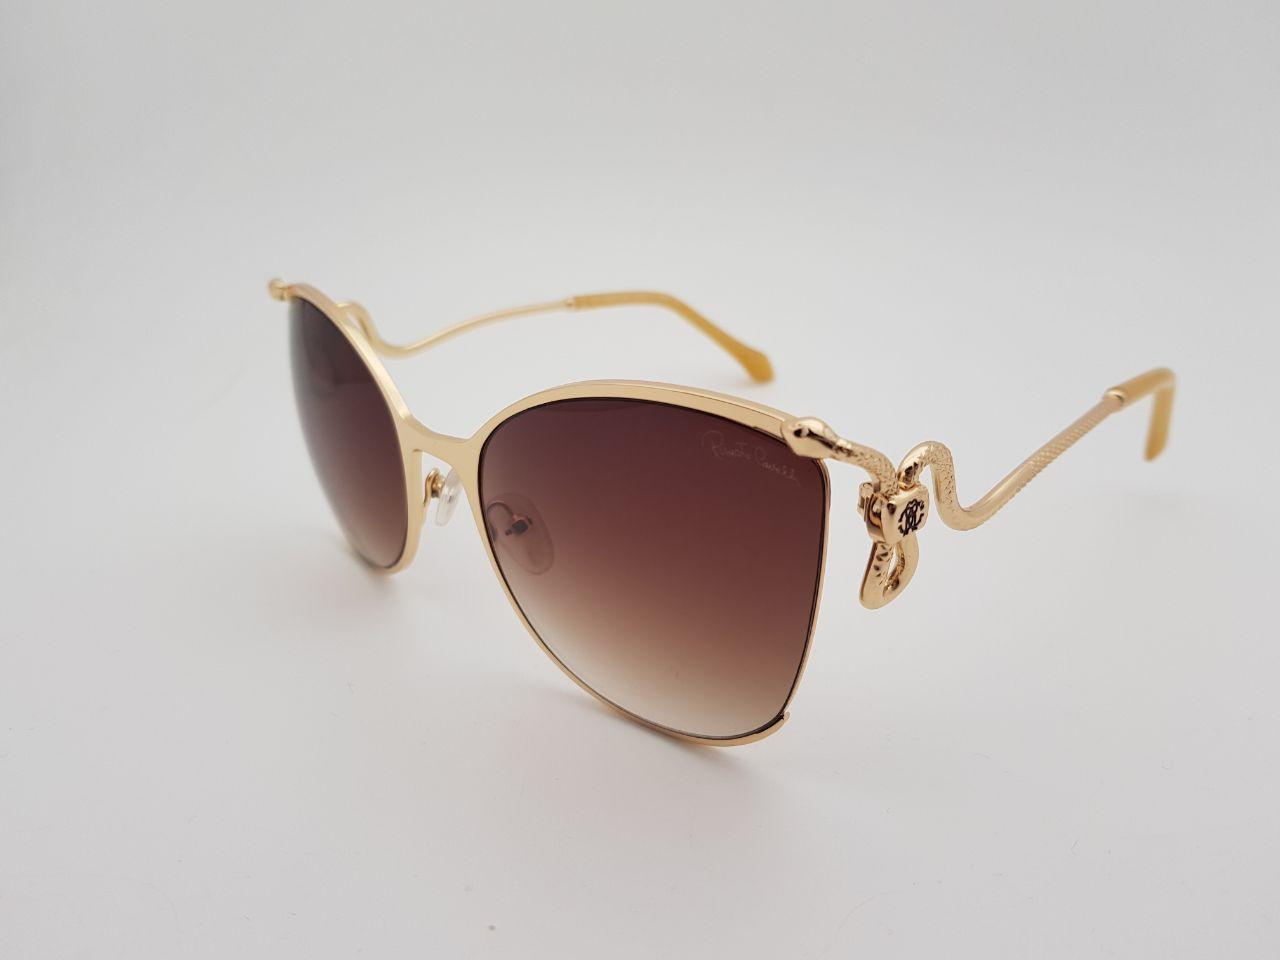 3f7813e7a5f2 Brand  Roberto Cavalli Eyewear SKU  F9DSGLRC001 Price  185 AED Colour   Brown Contact  +971506572801